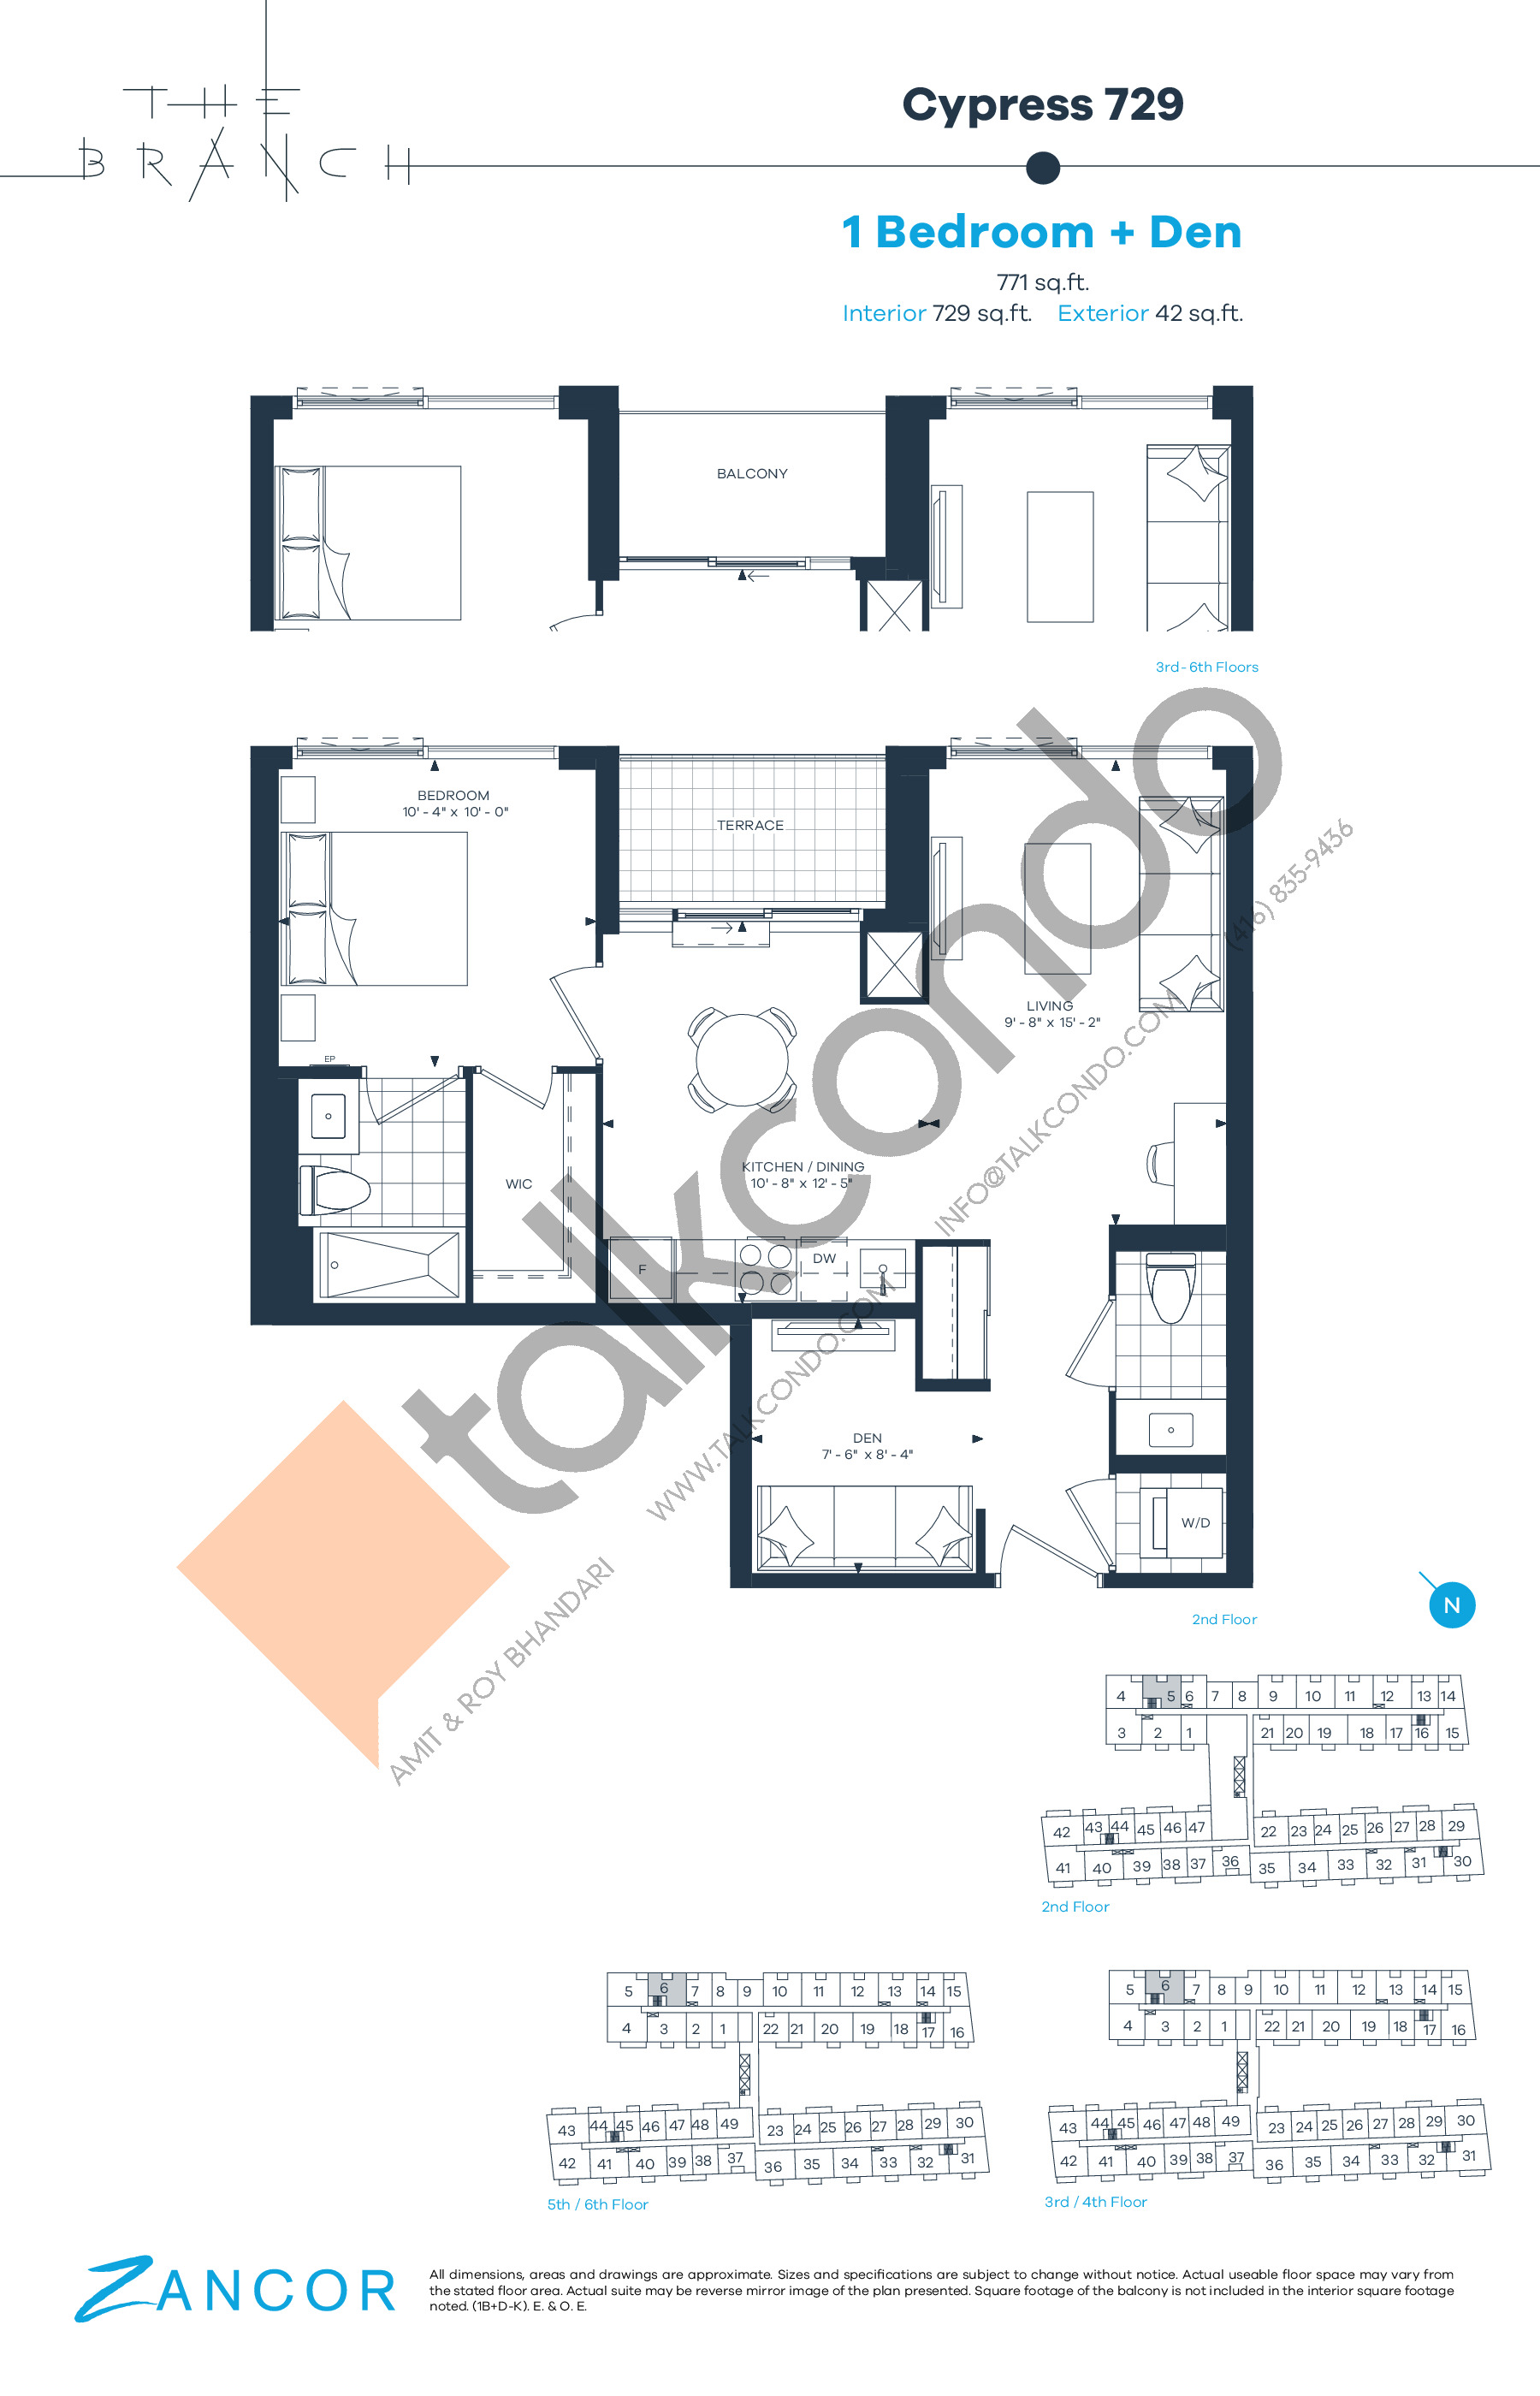 Cypress 729 Floor Plan at The Branch Condos - 729 sq.ft